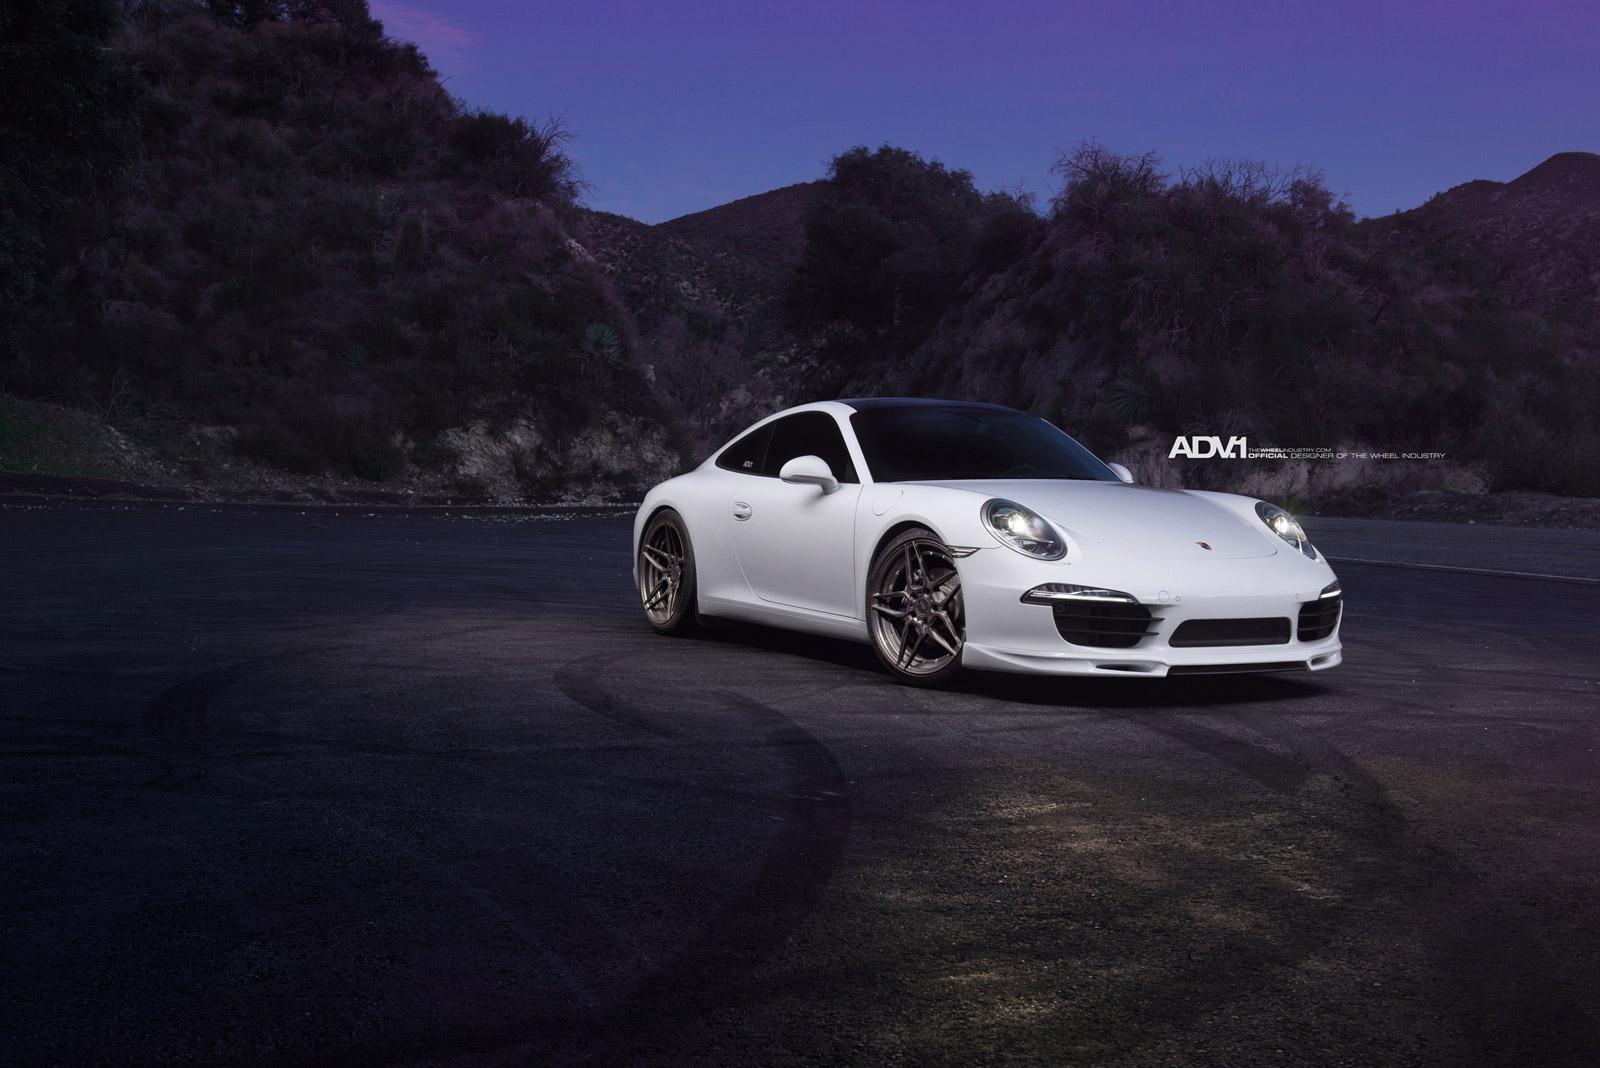 ADV1-Wheels-Porsche-991-Carrera-ADV05SMV2CS-9